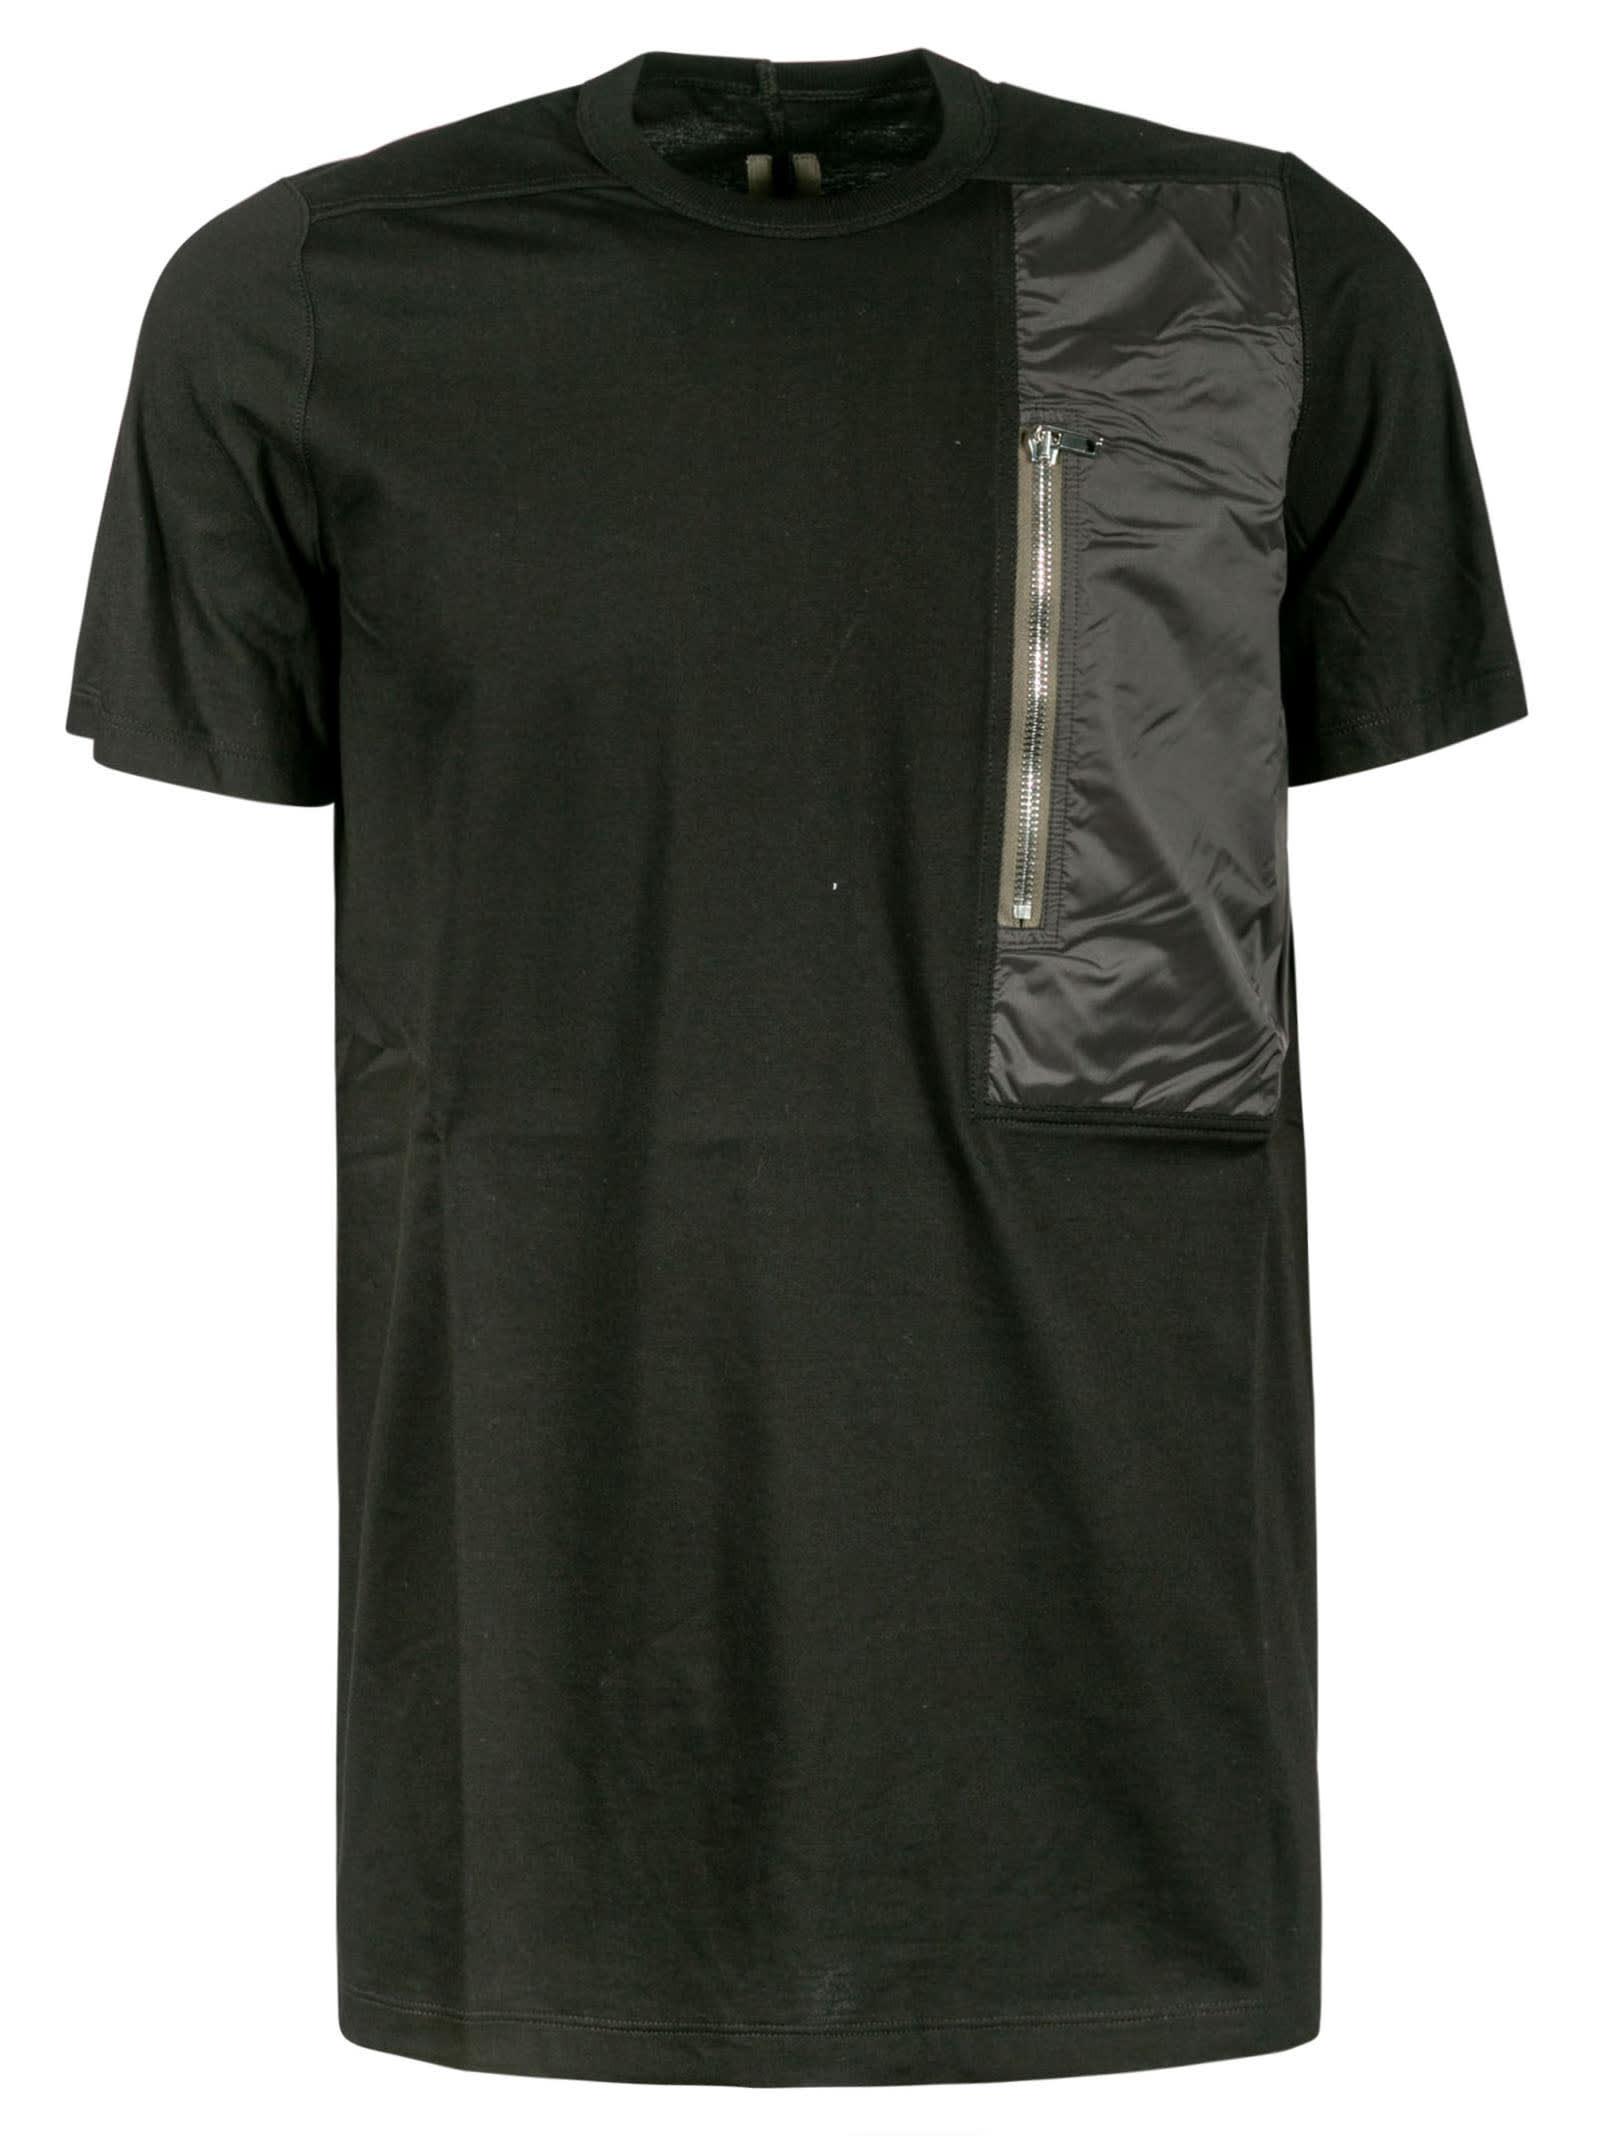 Rick Owens T-shirts SIDE ZIP POCKET DETAIL T-SHIRT